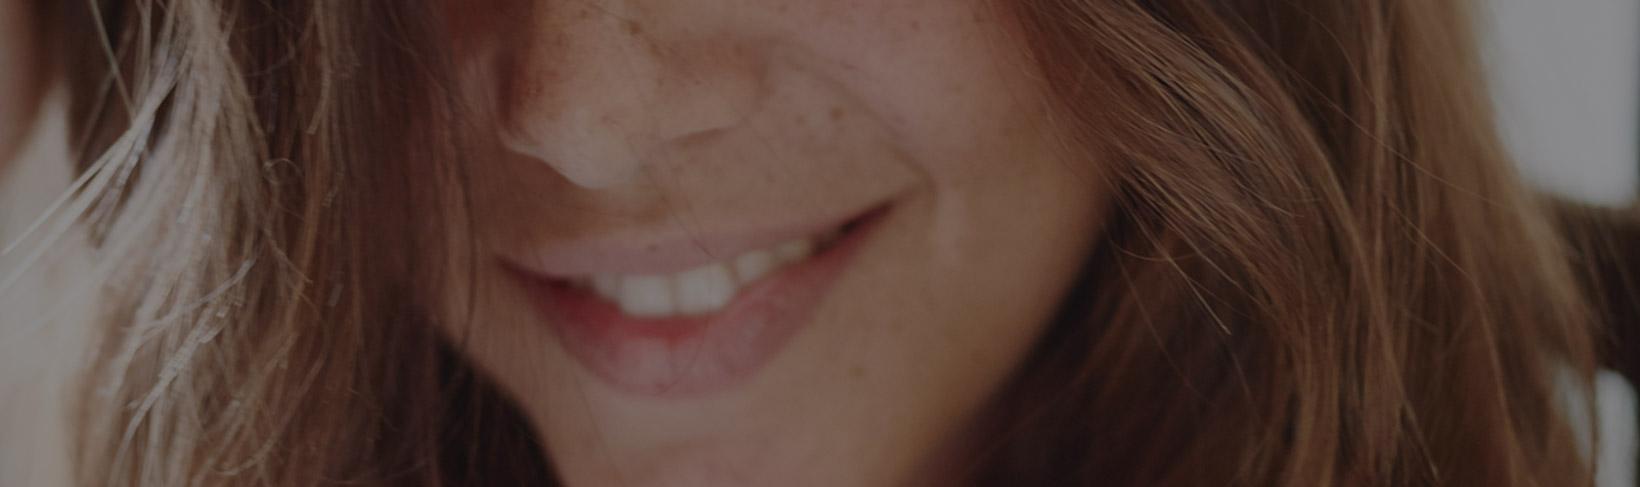 invisalign ortodoncia tres torres Barcelona sonrisa